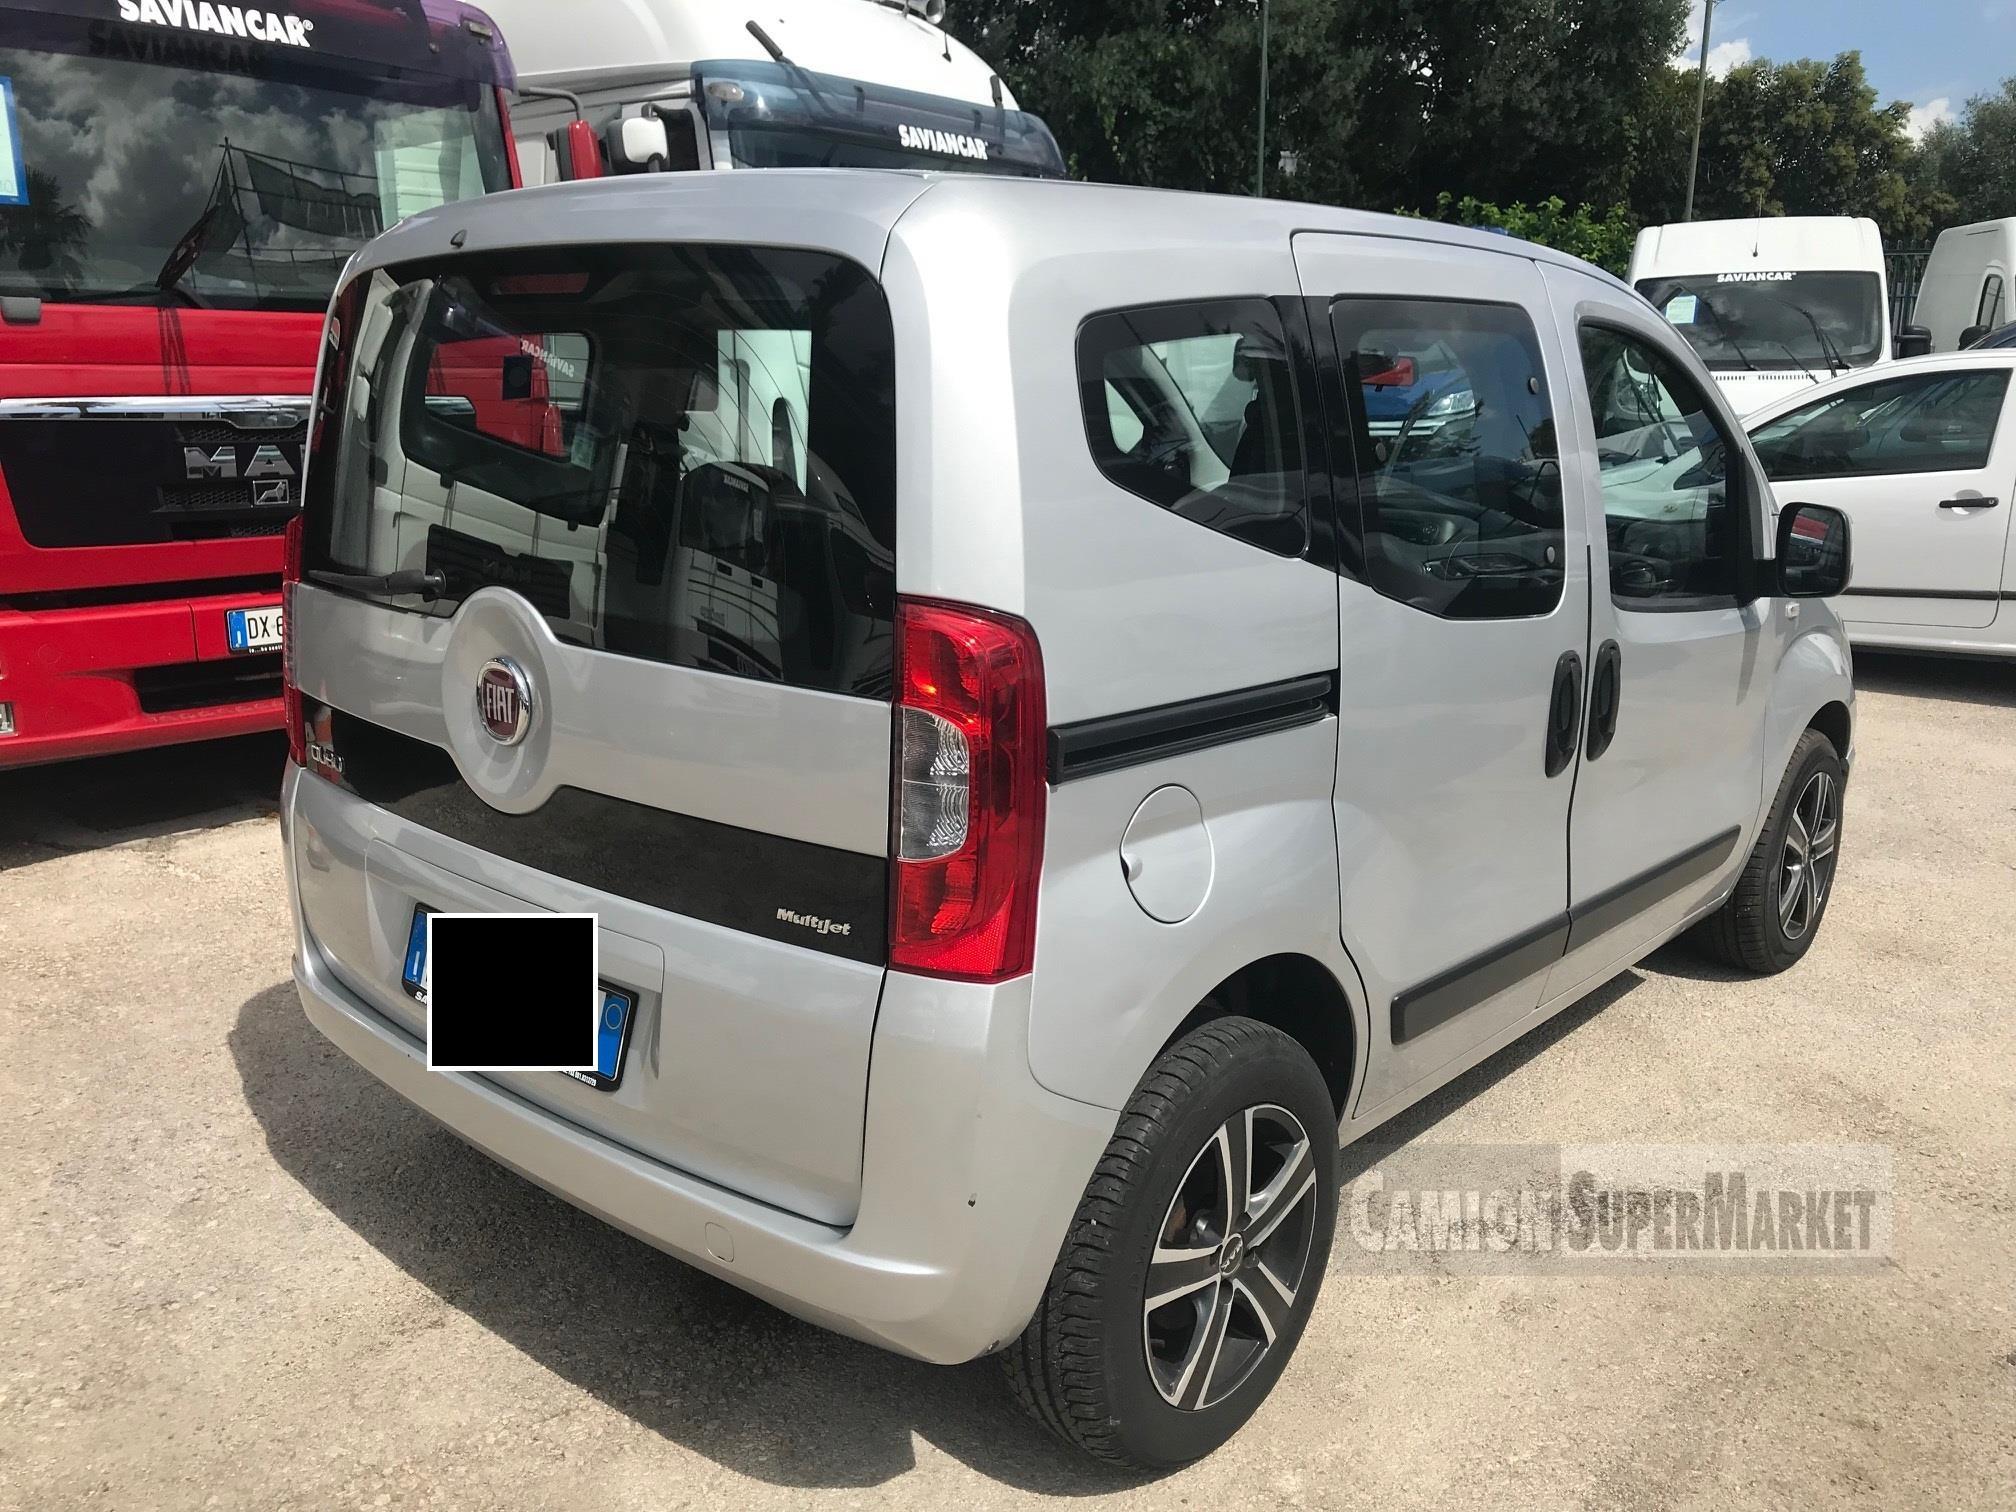 Fiat QUBO used 2014